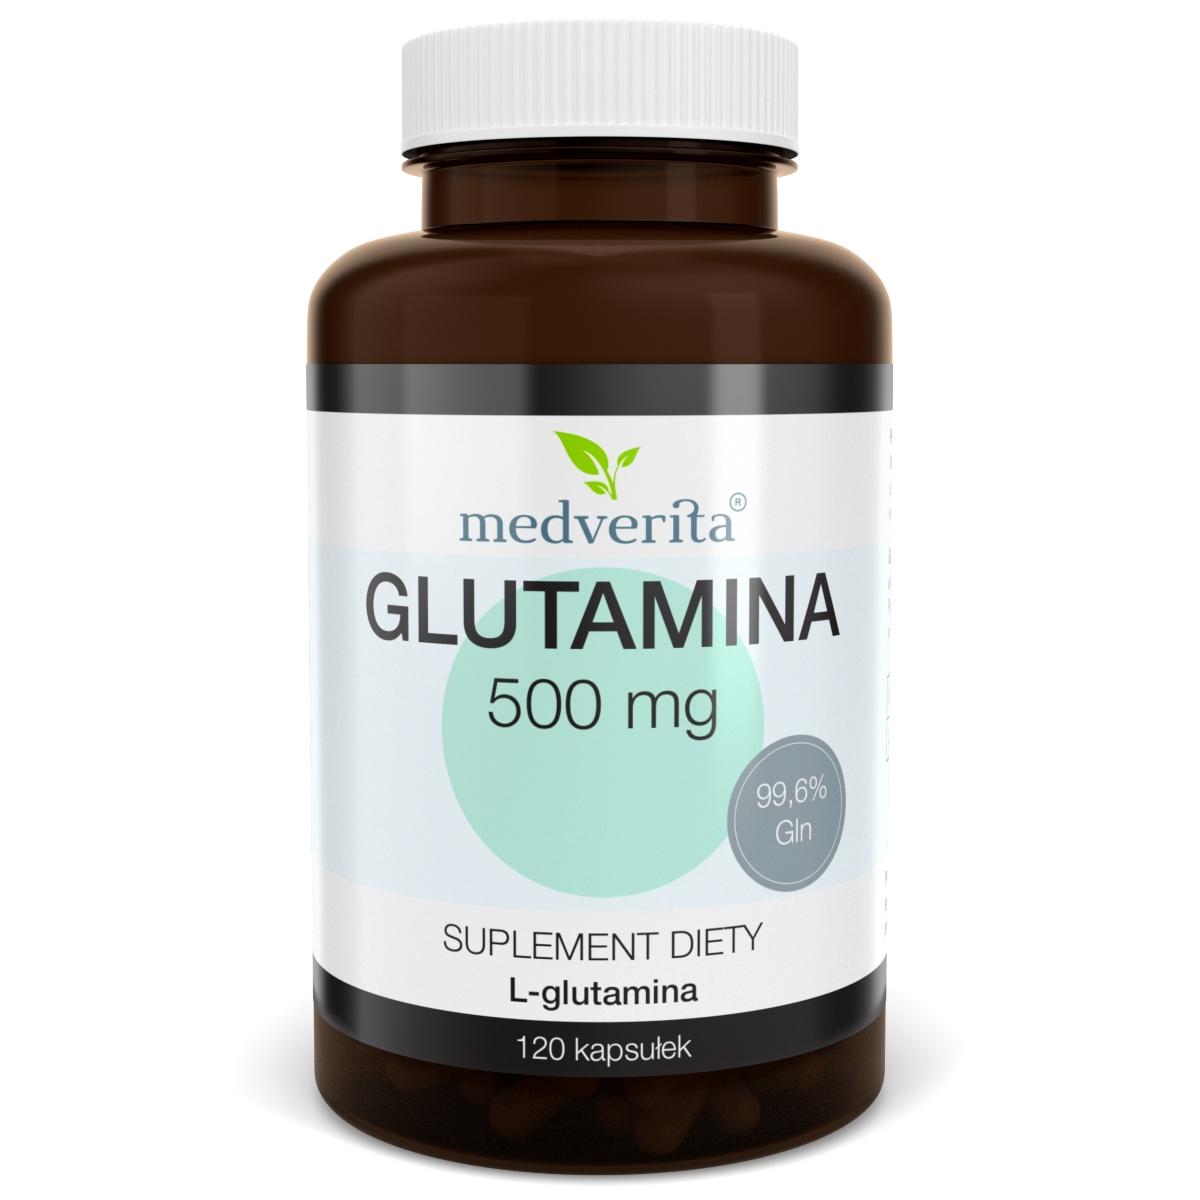 Glutamina L-glutamina 500 mg - 120 kapsułek